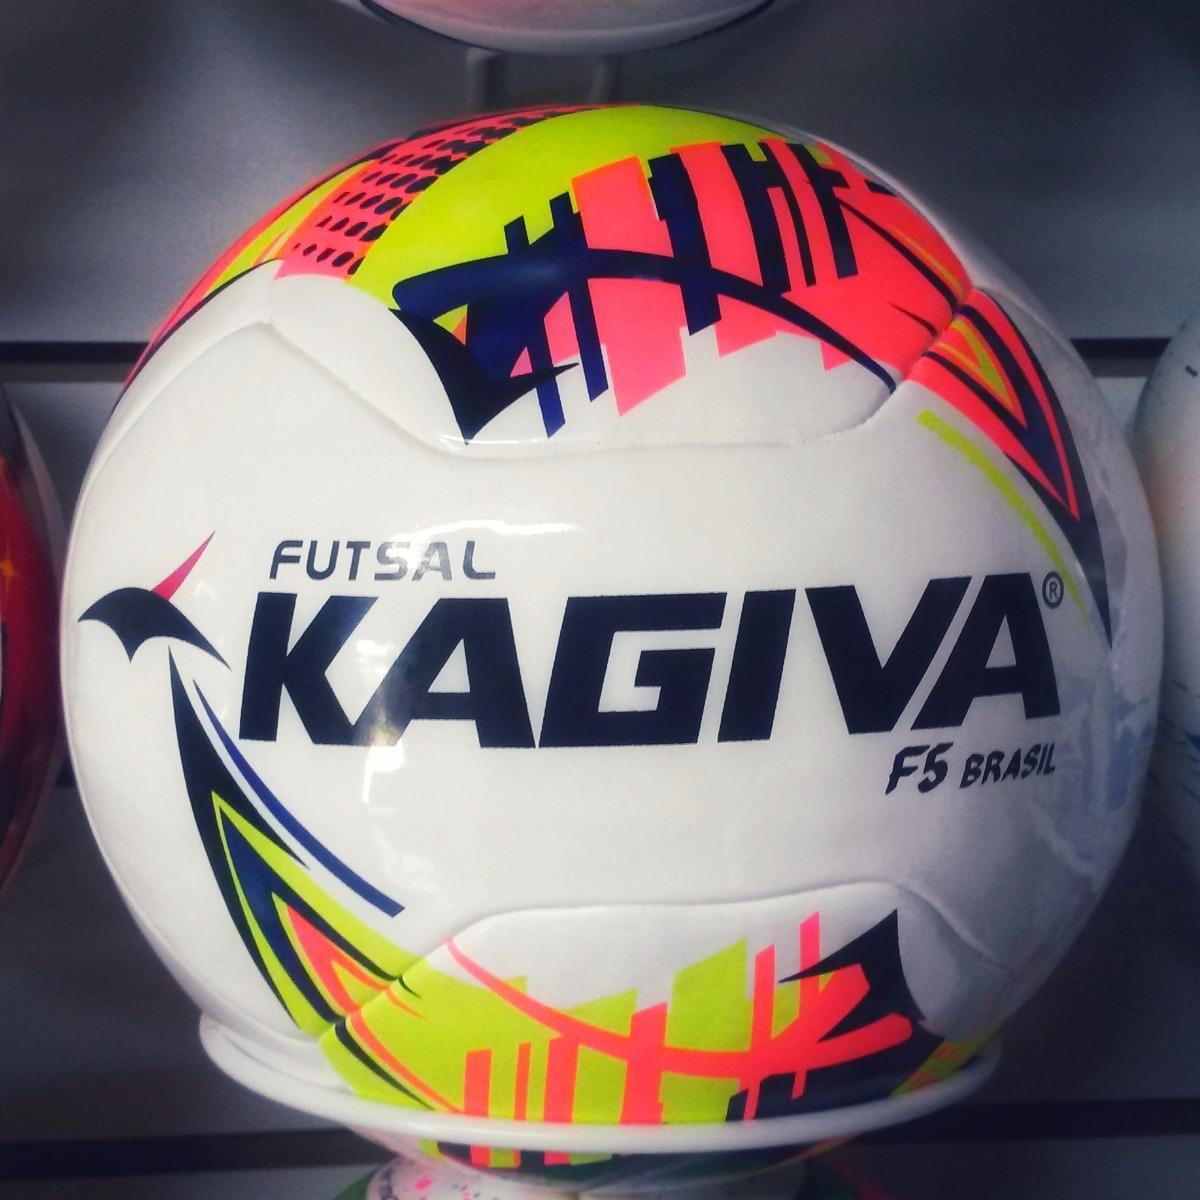 Bola De Futsal Kagiva F5 Brasil Pro - Original Kagiva 2017 - R  119 ... 9dbc131e5215c